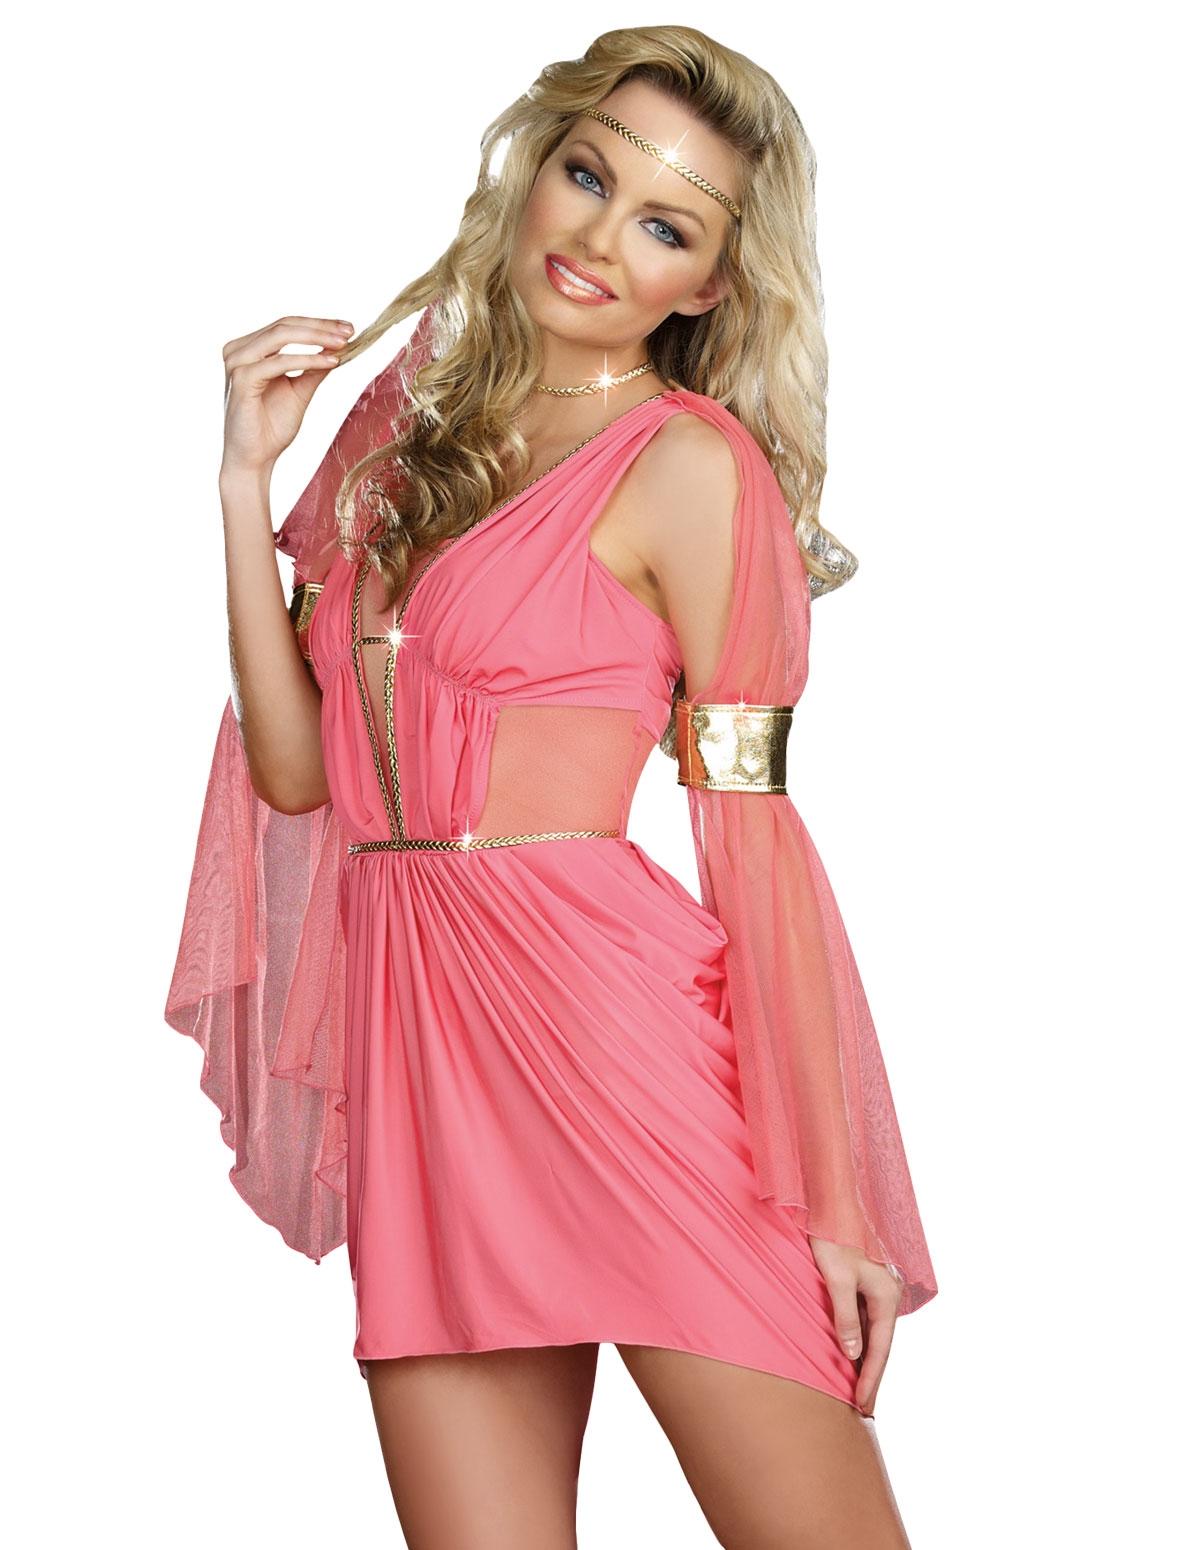 Goddess Of Glam Costume